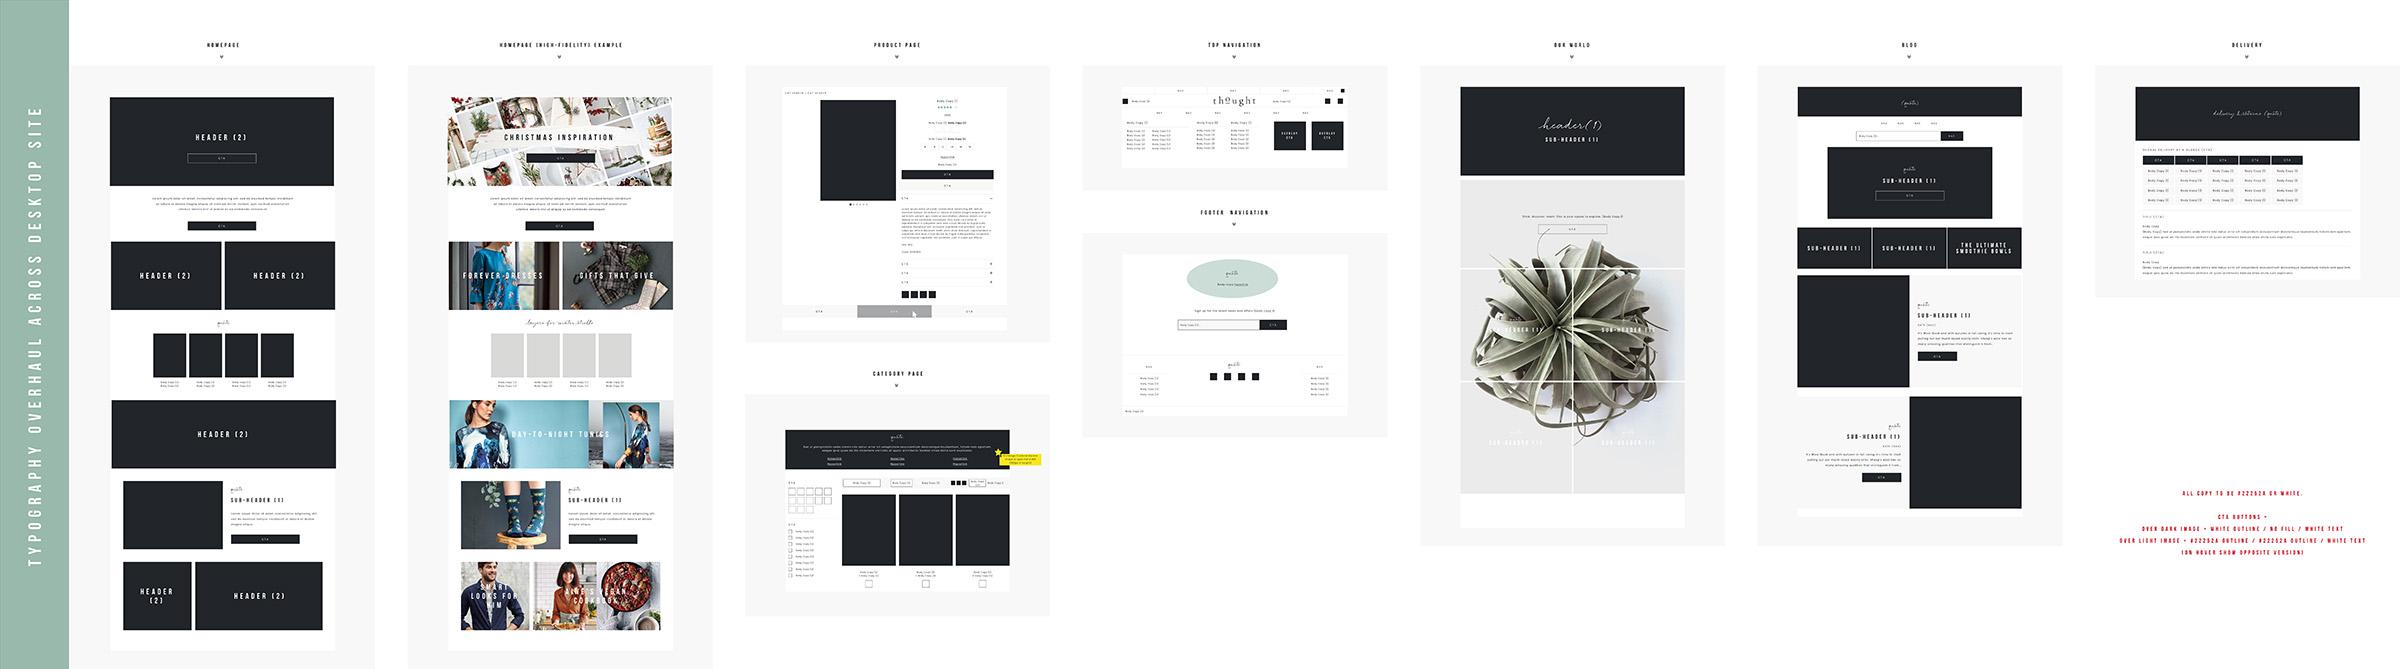 lauren-grace-design-ui-digital-brand-designer-sustainable-thought-fashion-typography.jpg